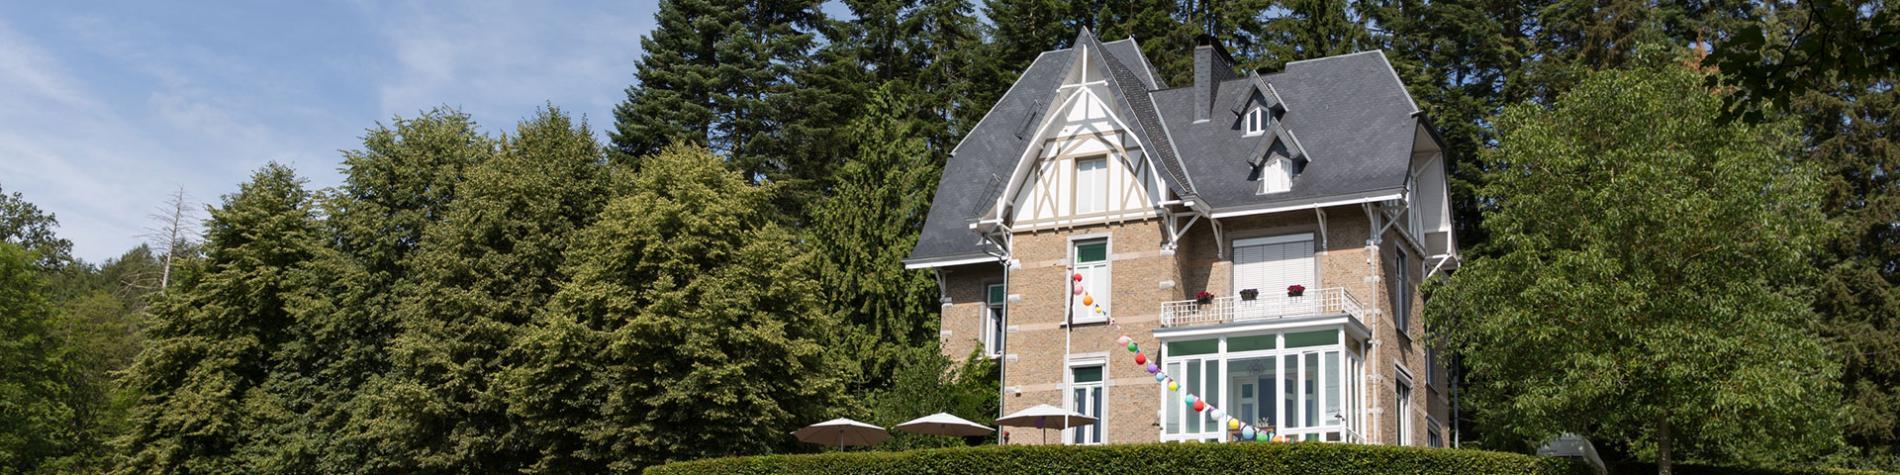 Gîte - rural - Château - Borzeux - Stavelot